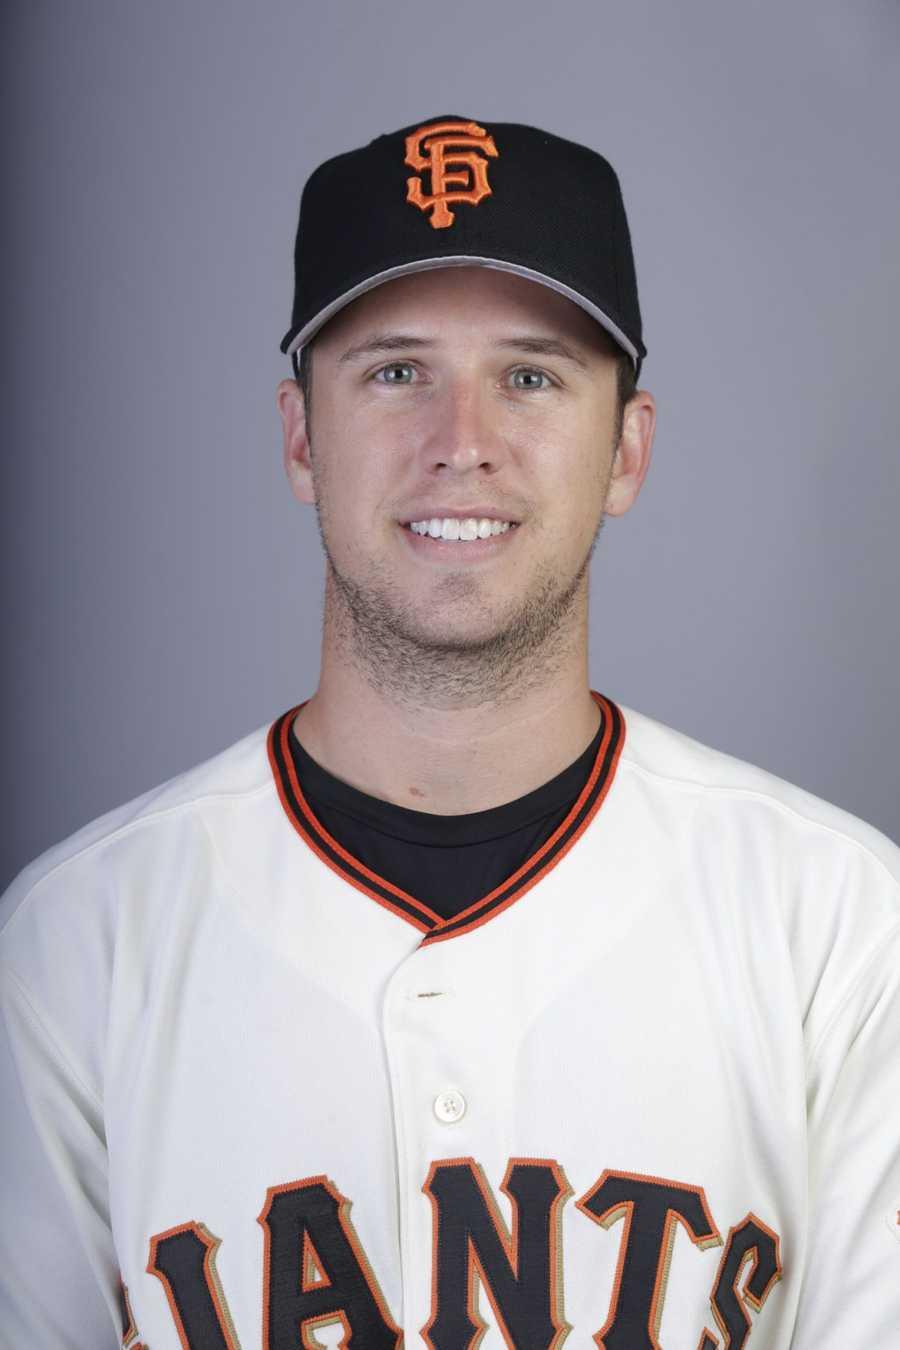 7)Buster Posey, San Francisco Giants